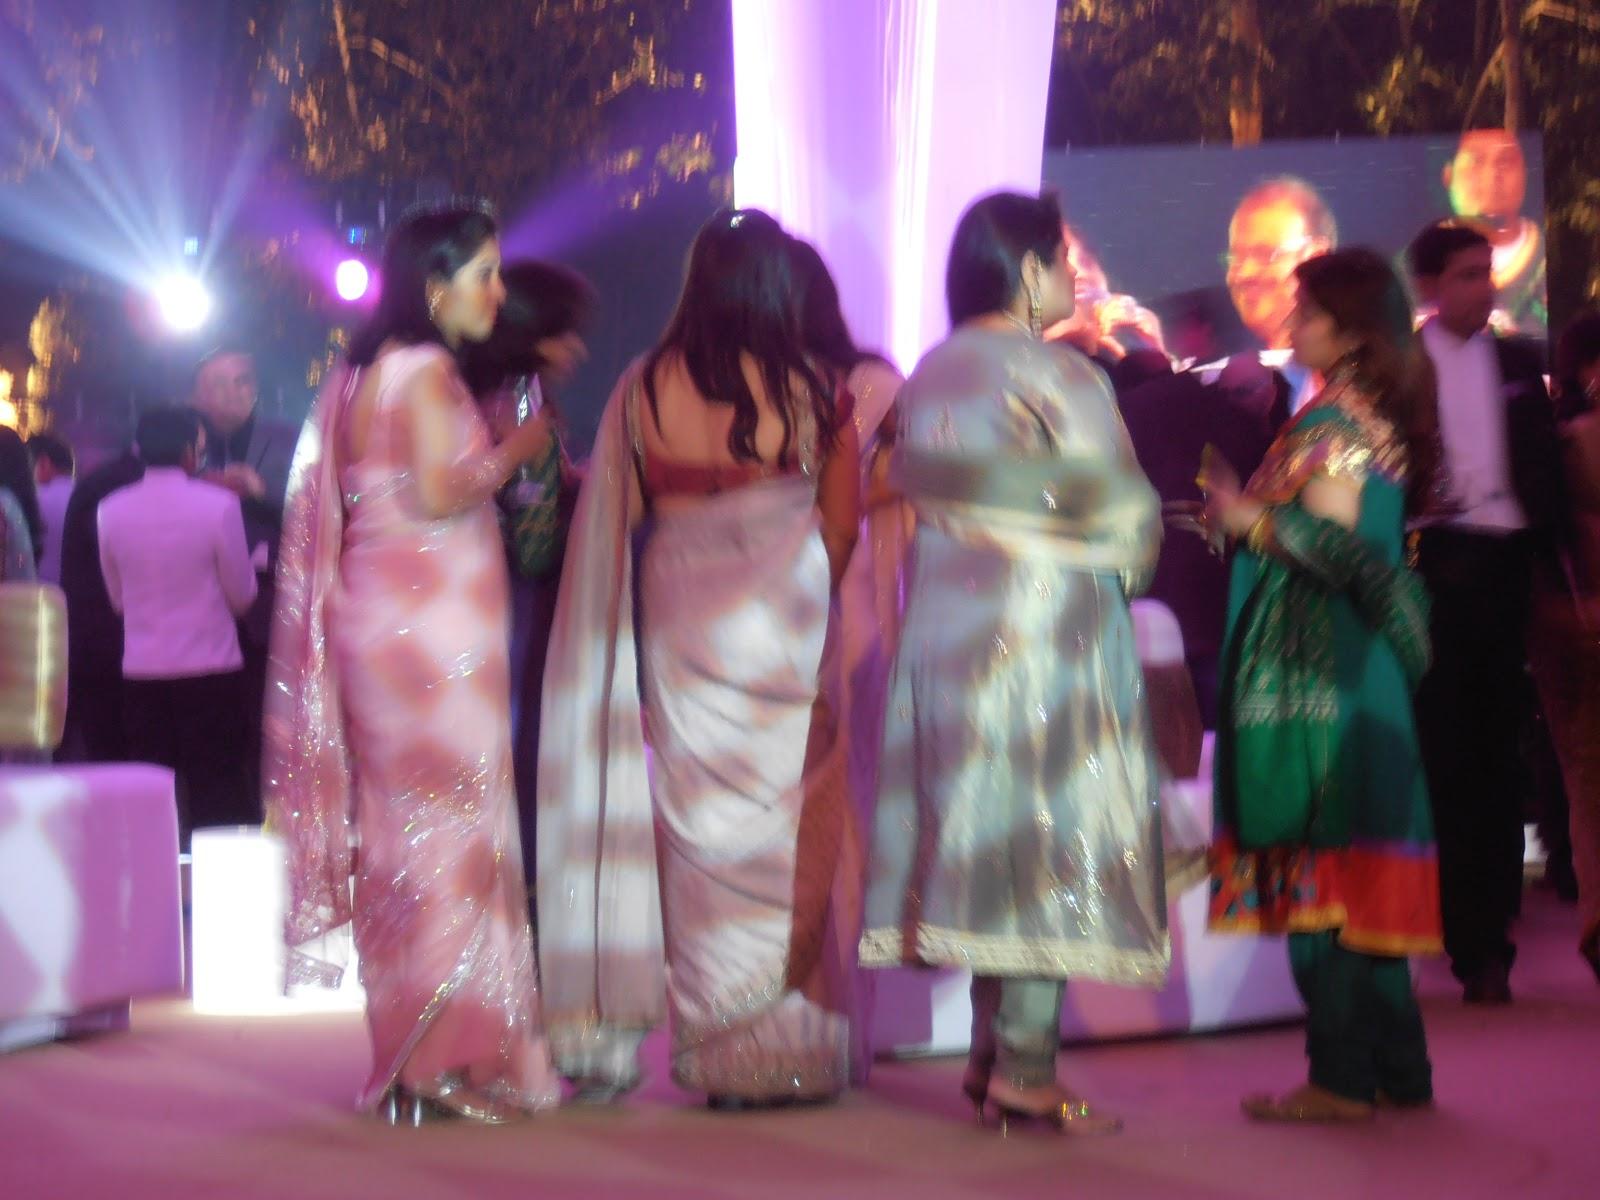 jerke in india some flashy wedding